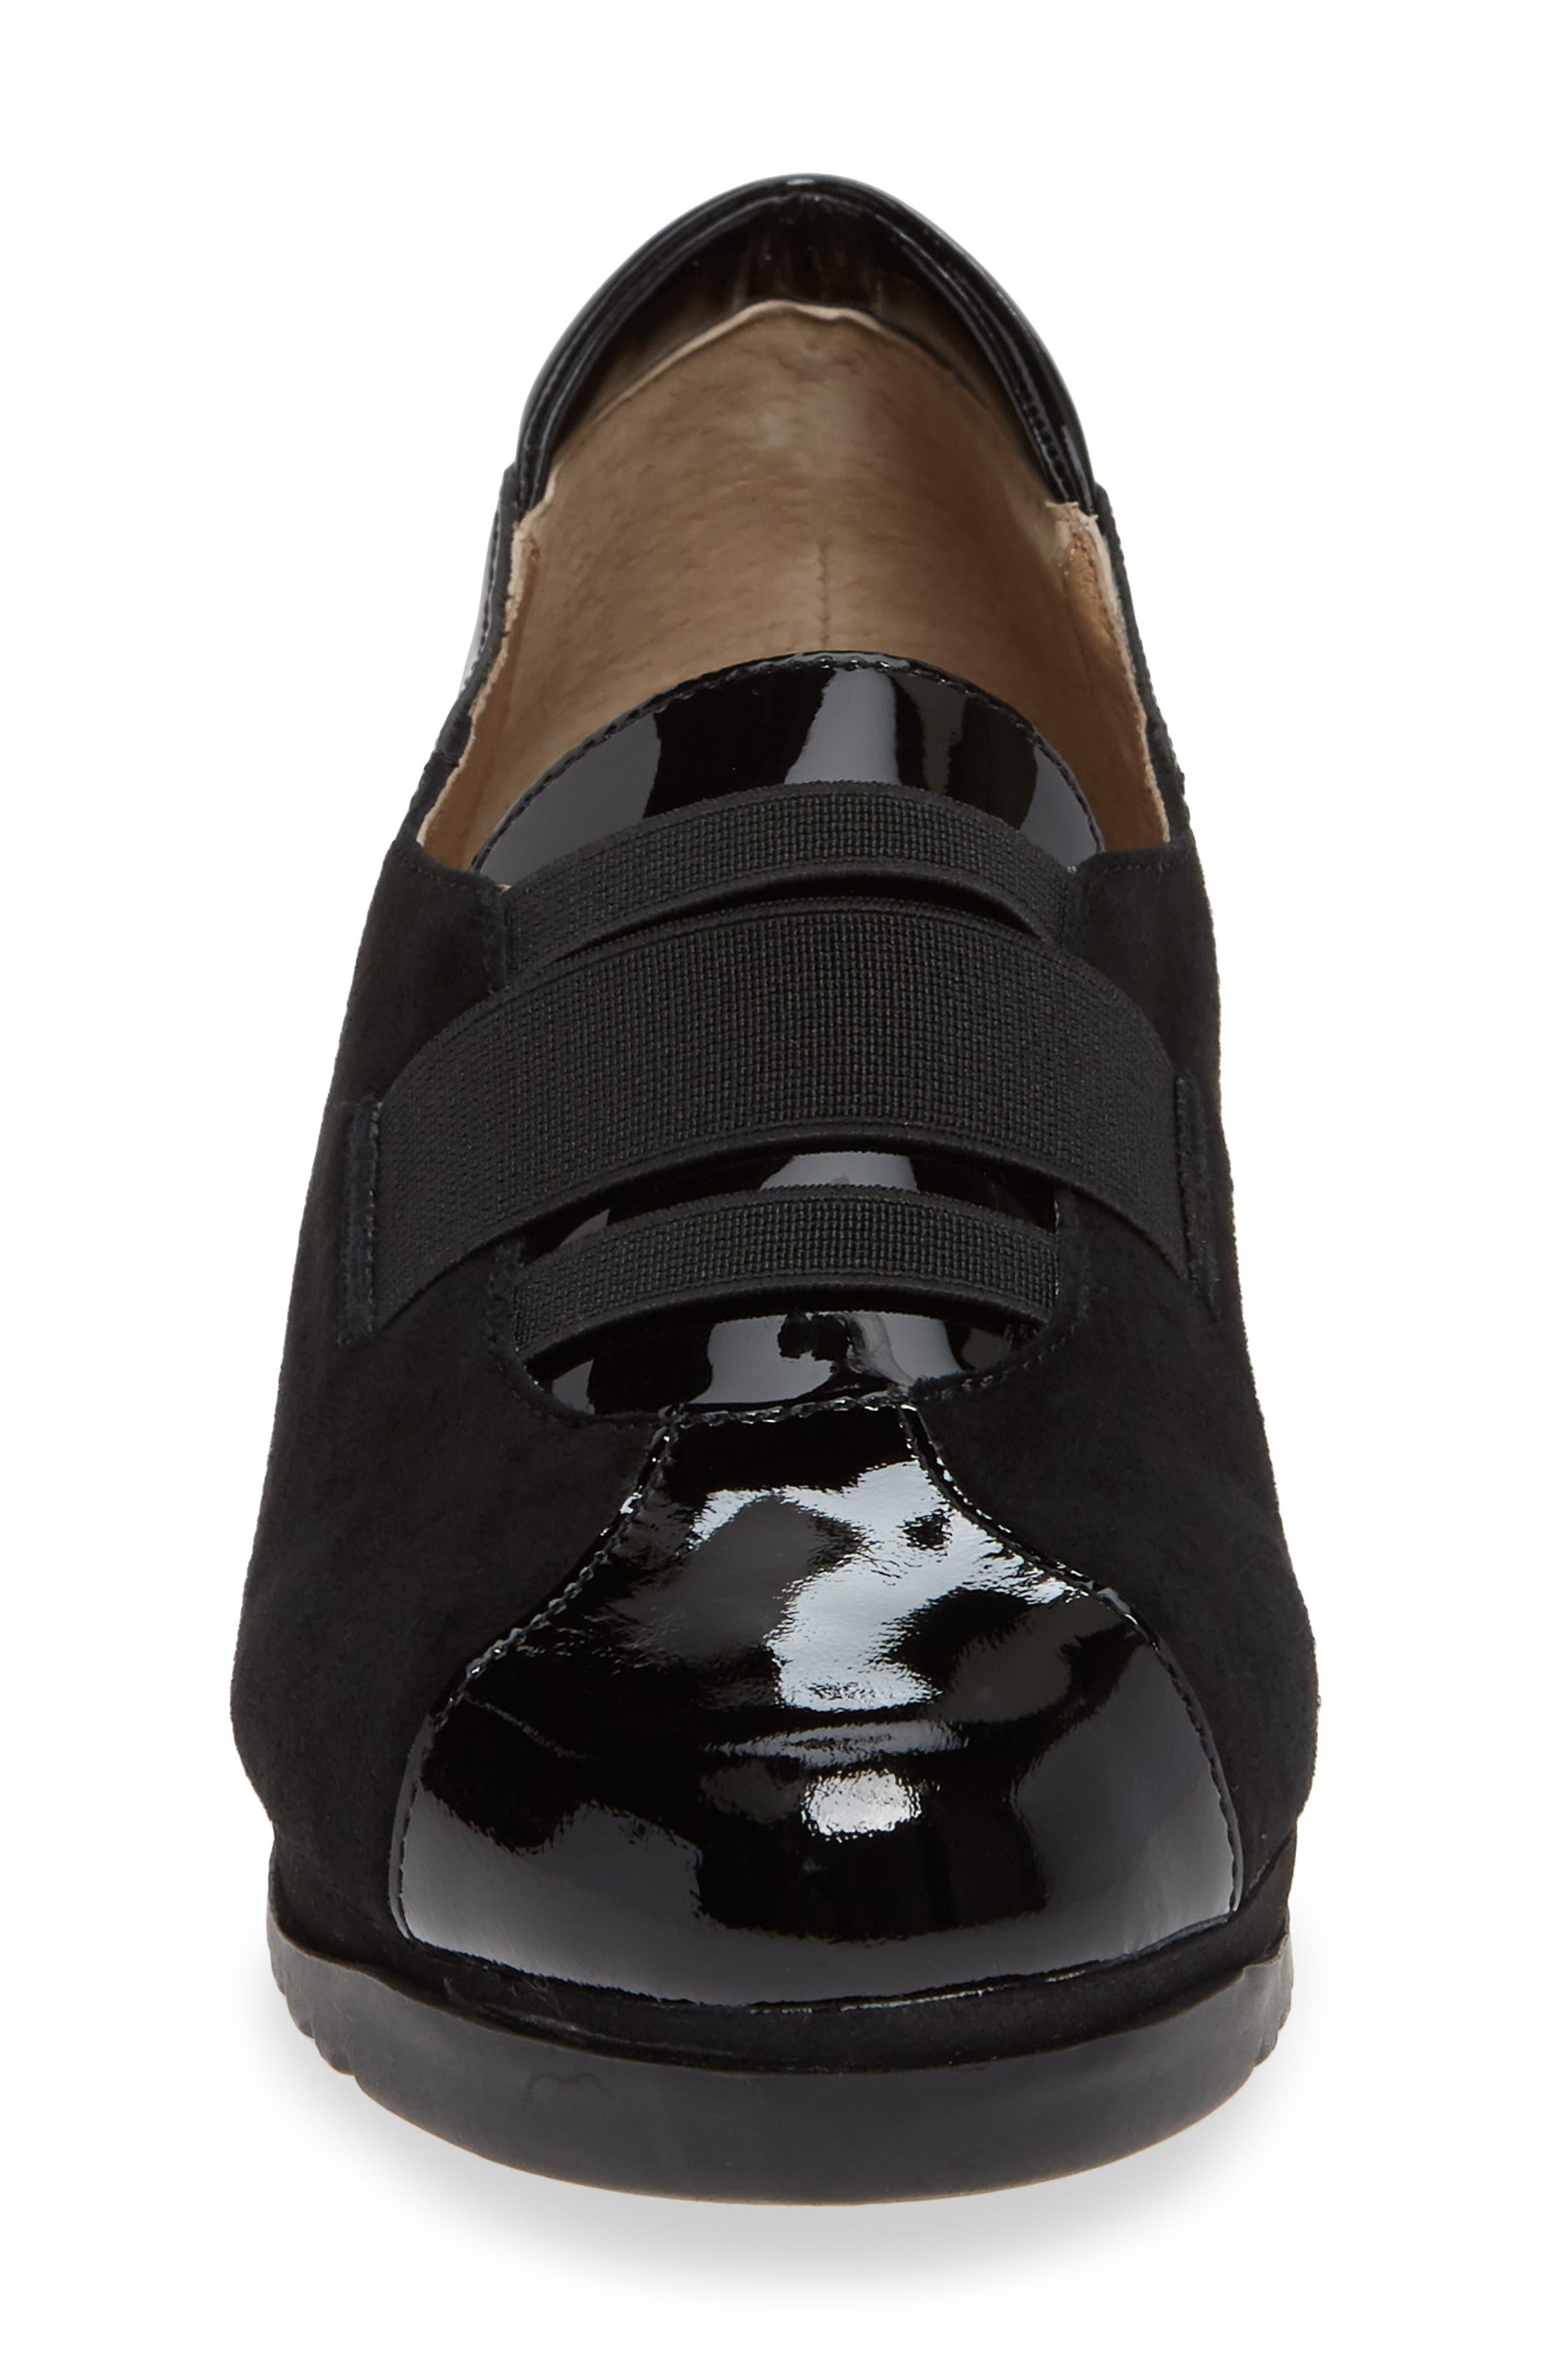 Taytum Sneaker,                             Alternate thumbnail 4, color,                             BLACK SUEDE